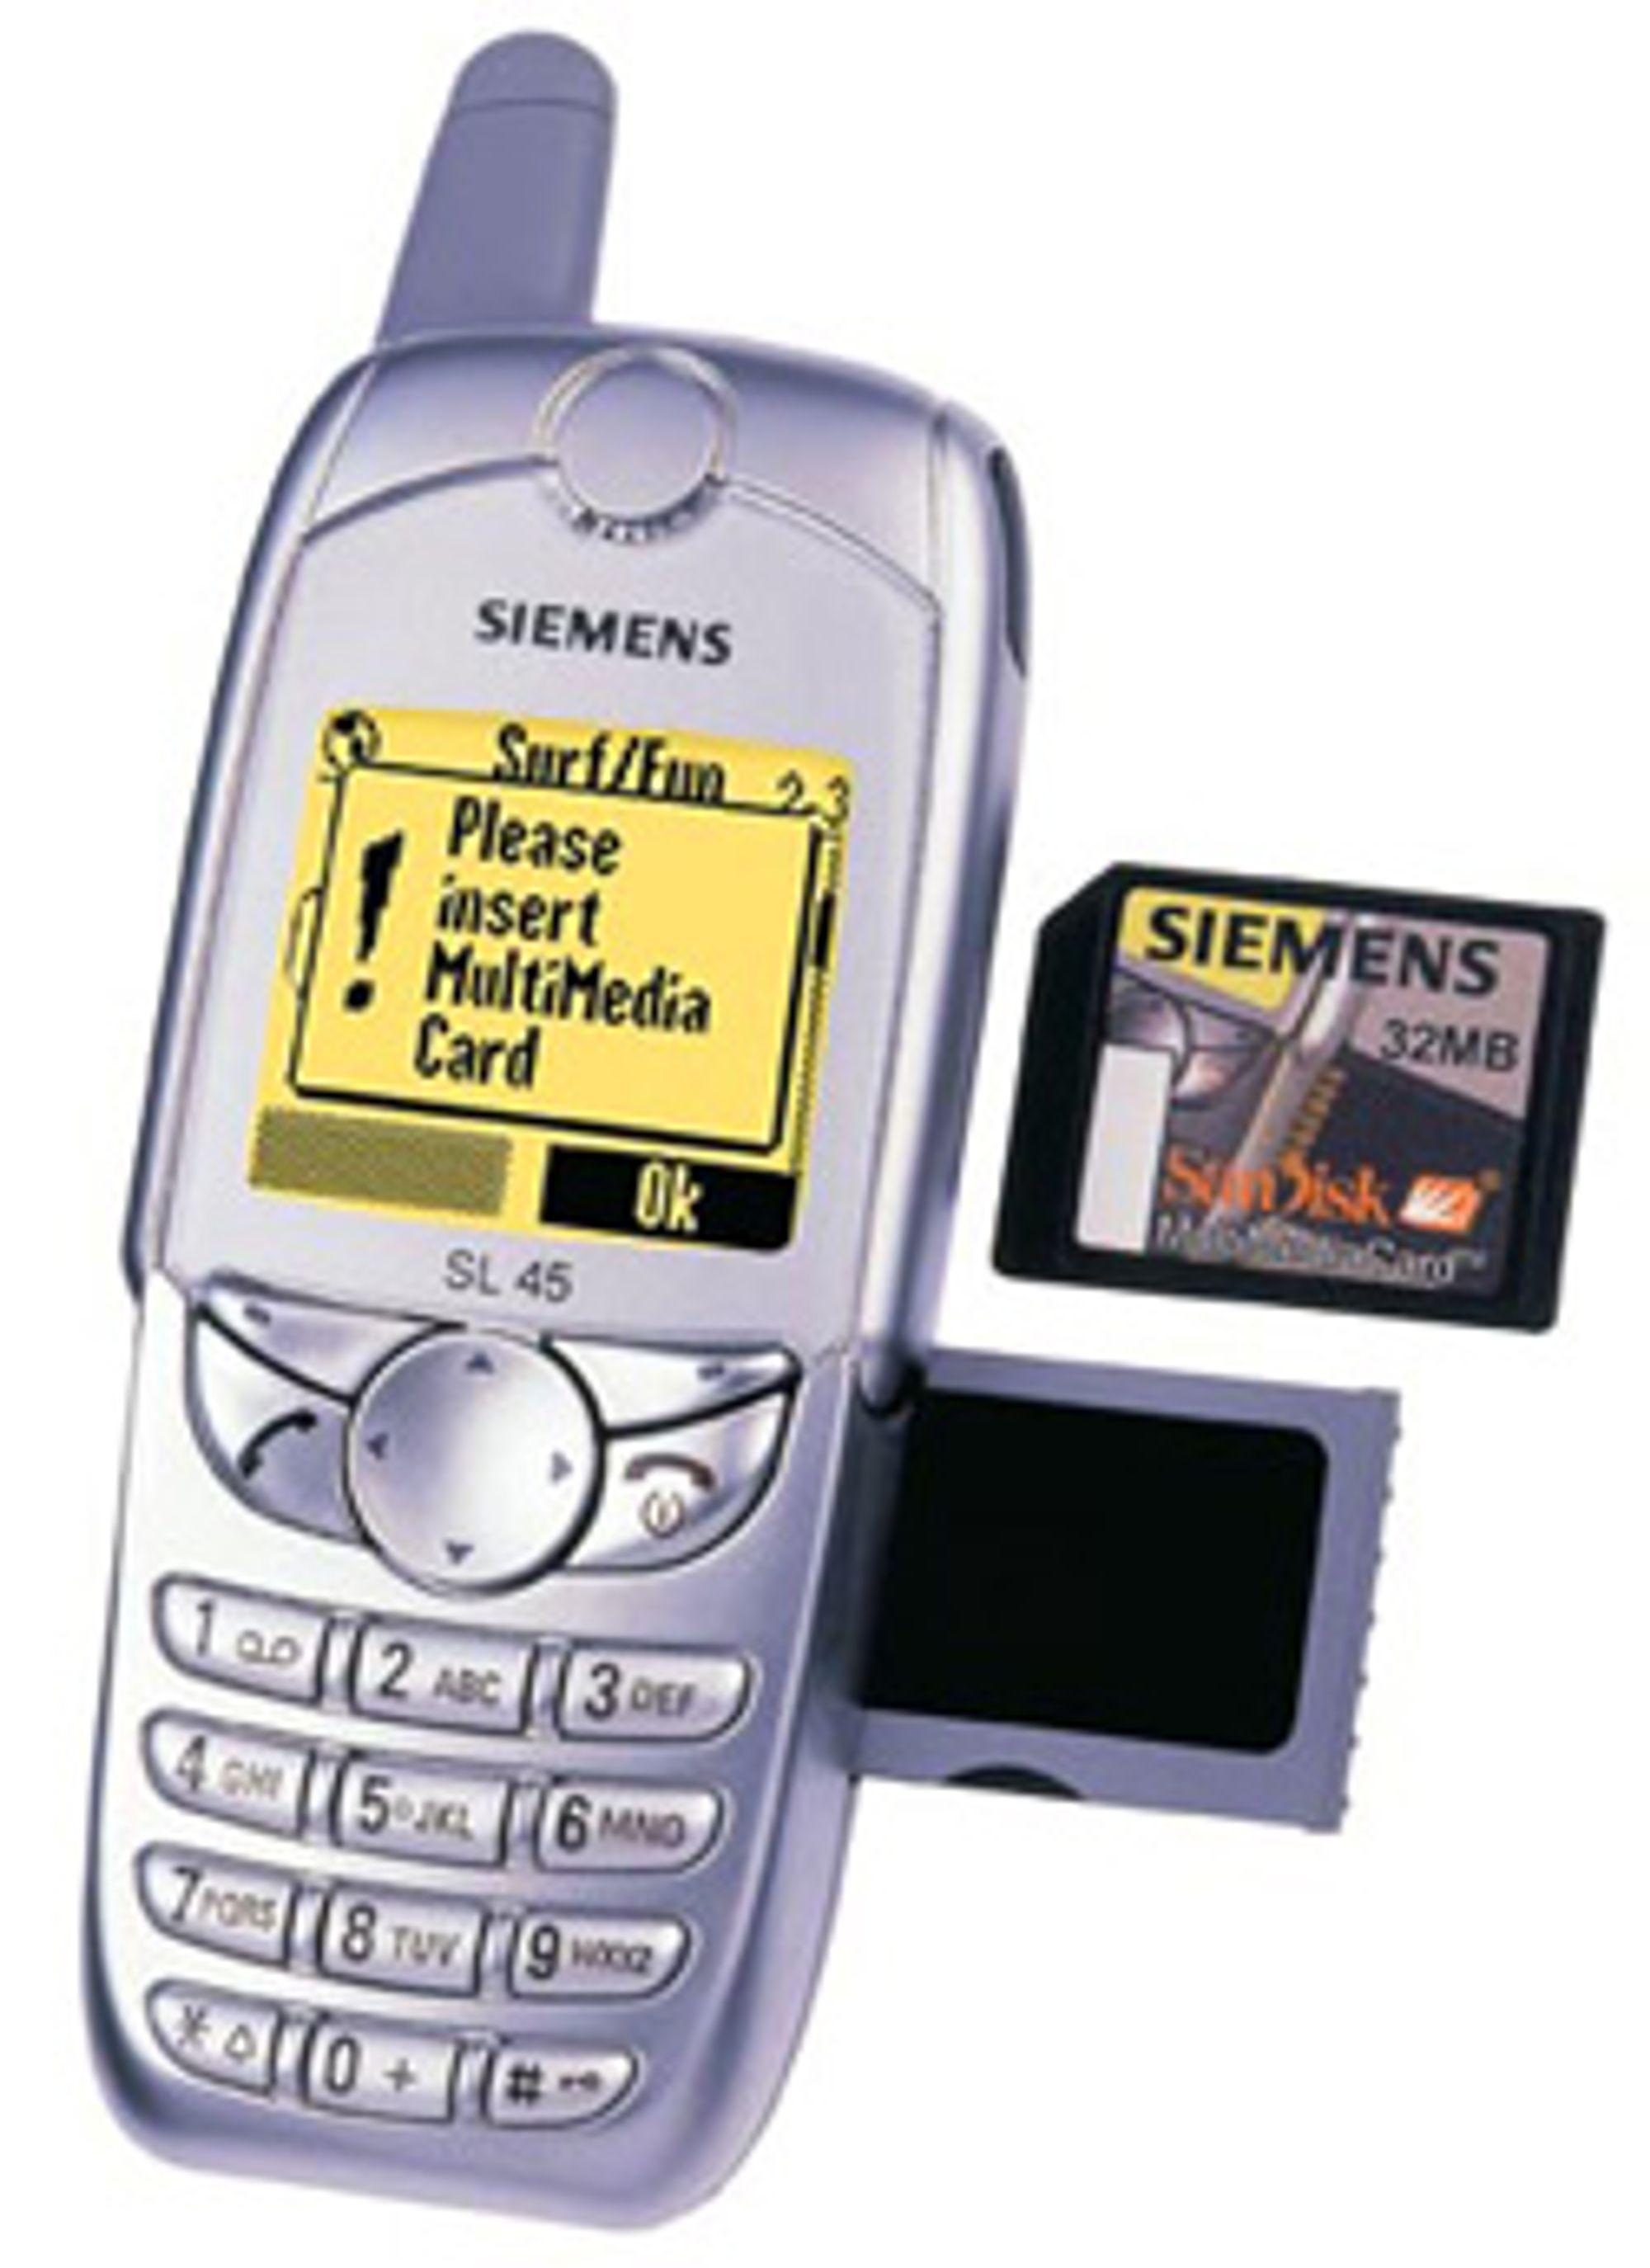 Siemens mobil